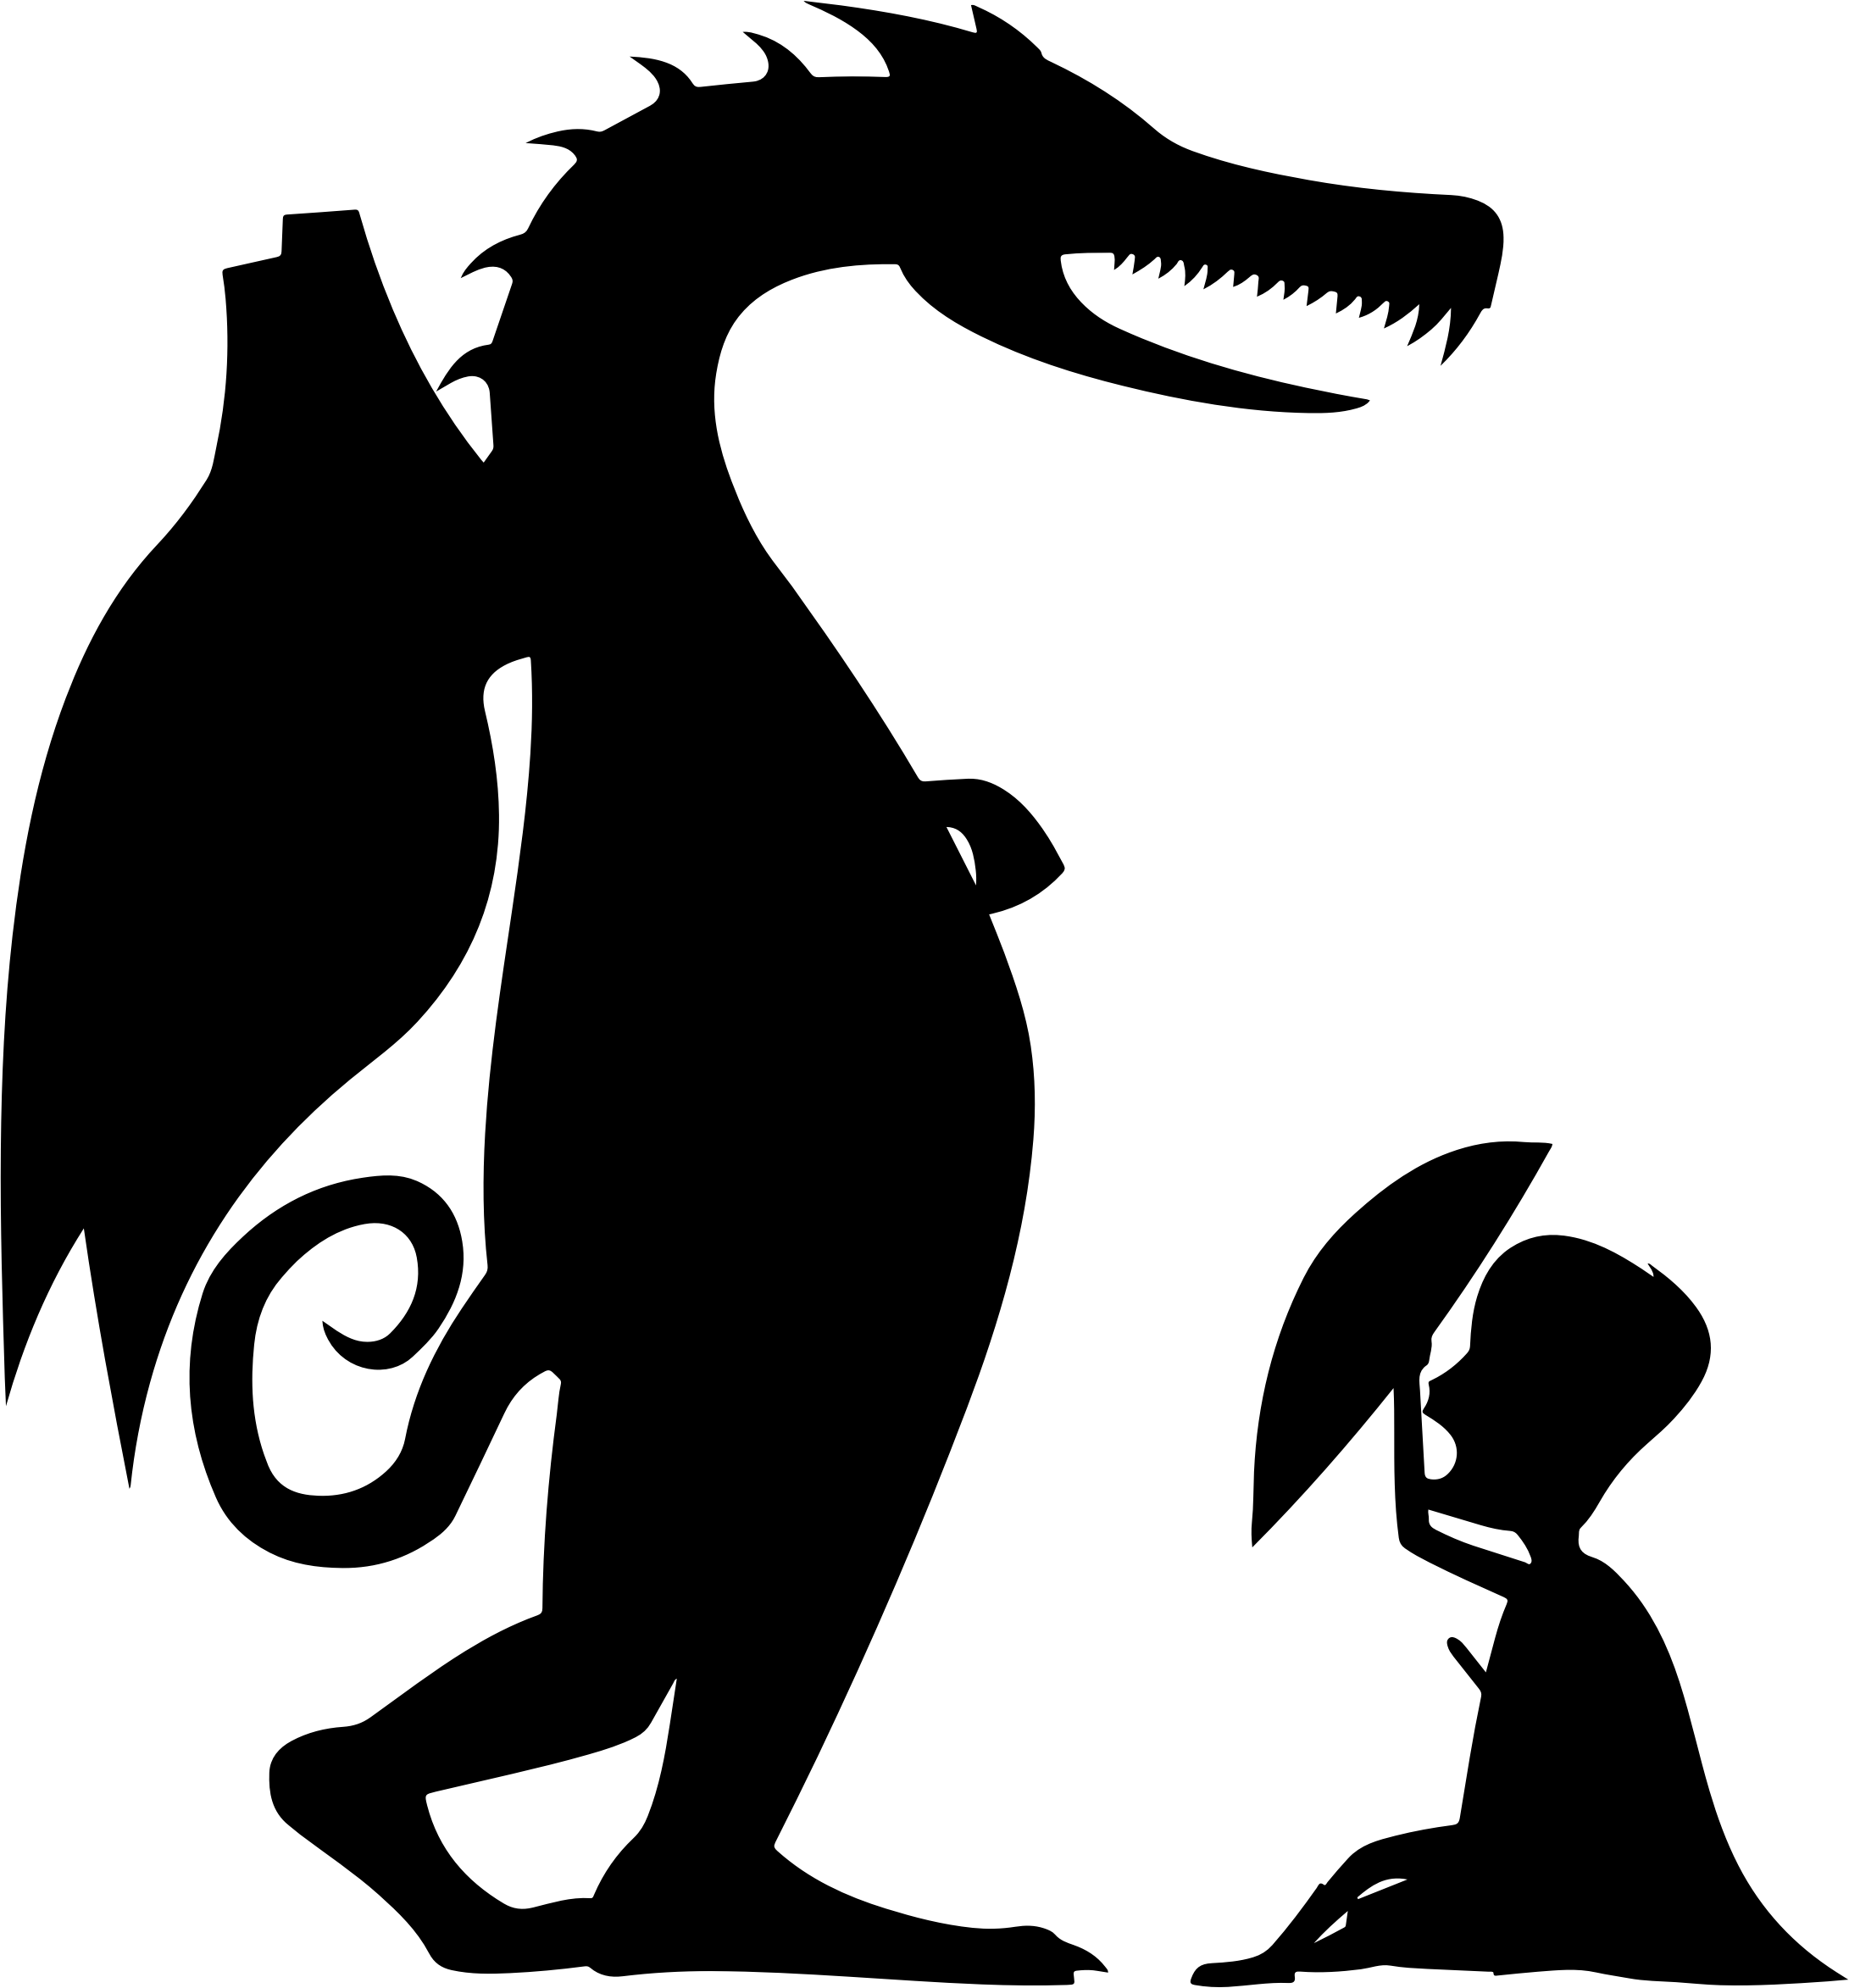 Clipart dragon stencil. George and silhouette big